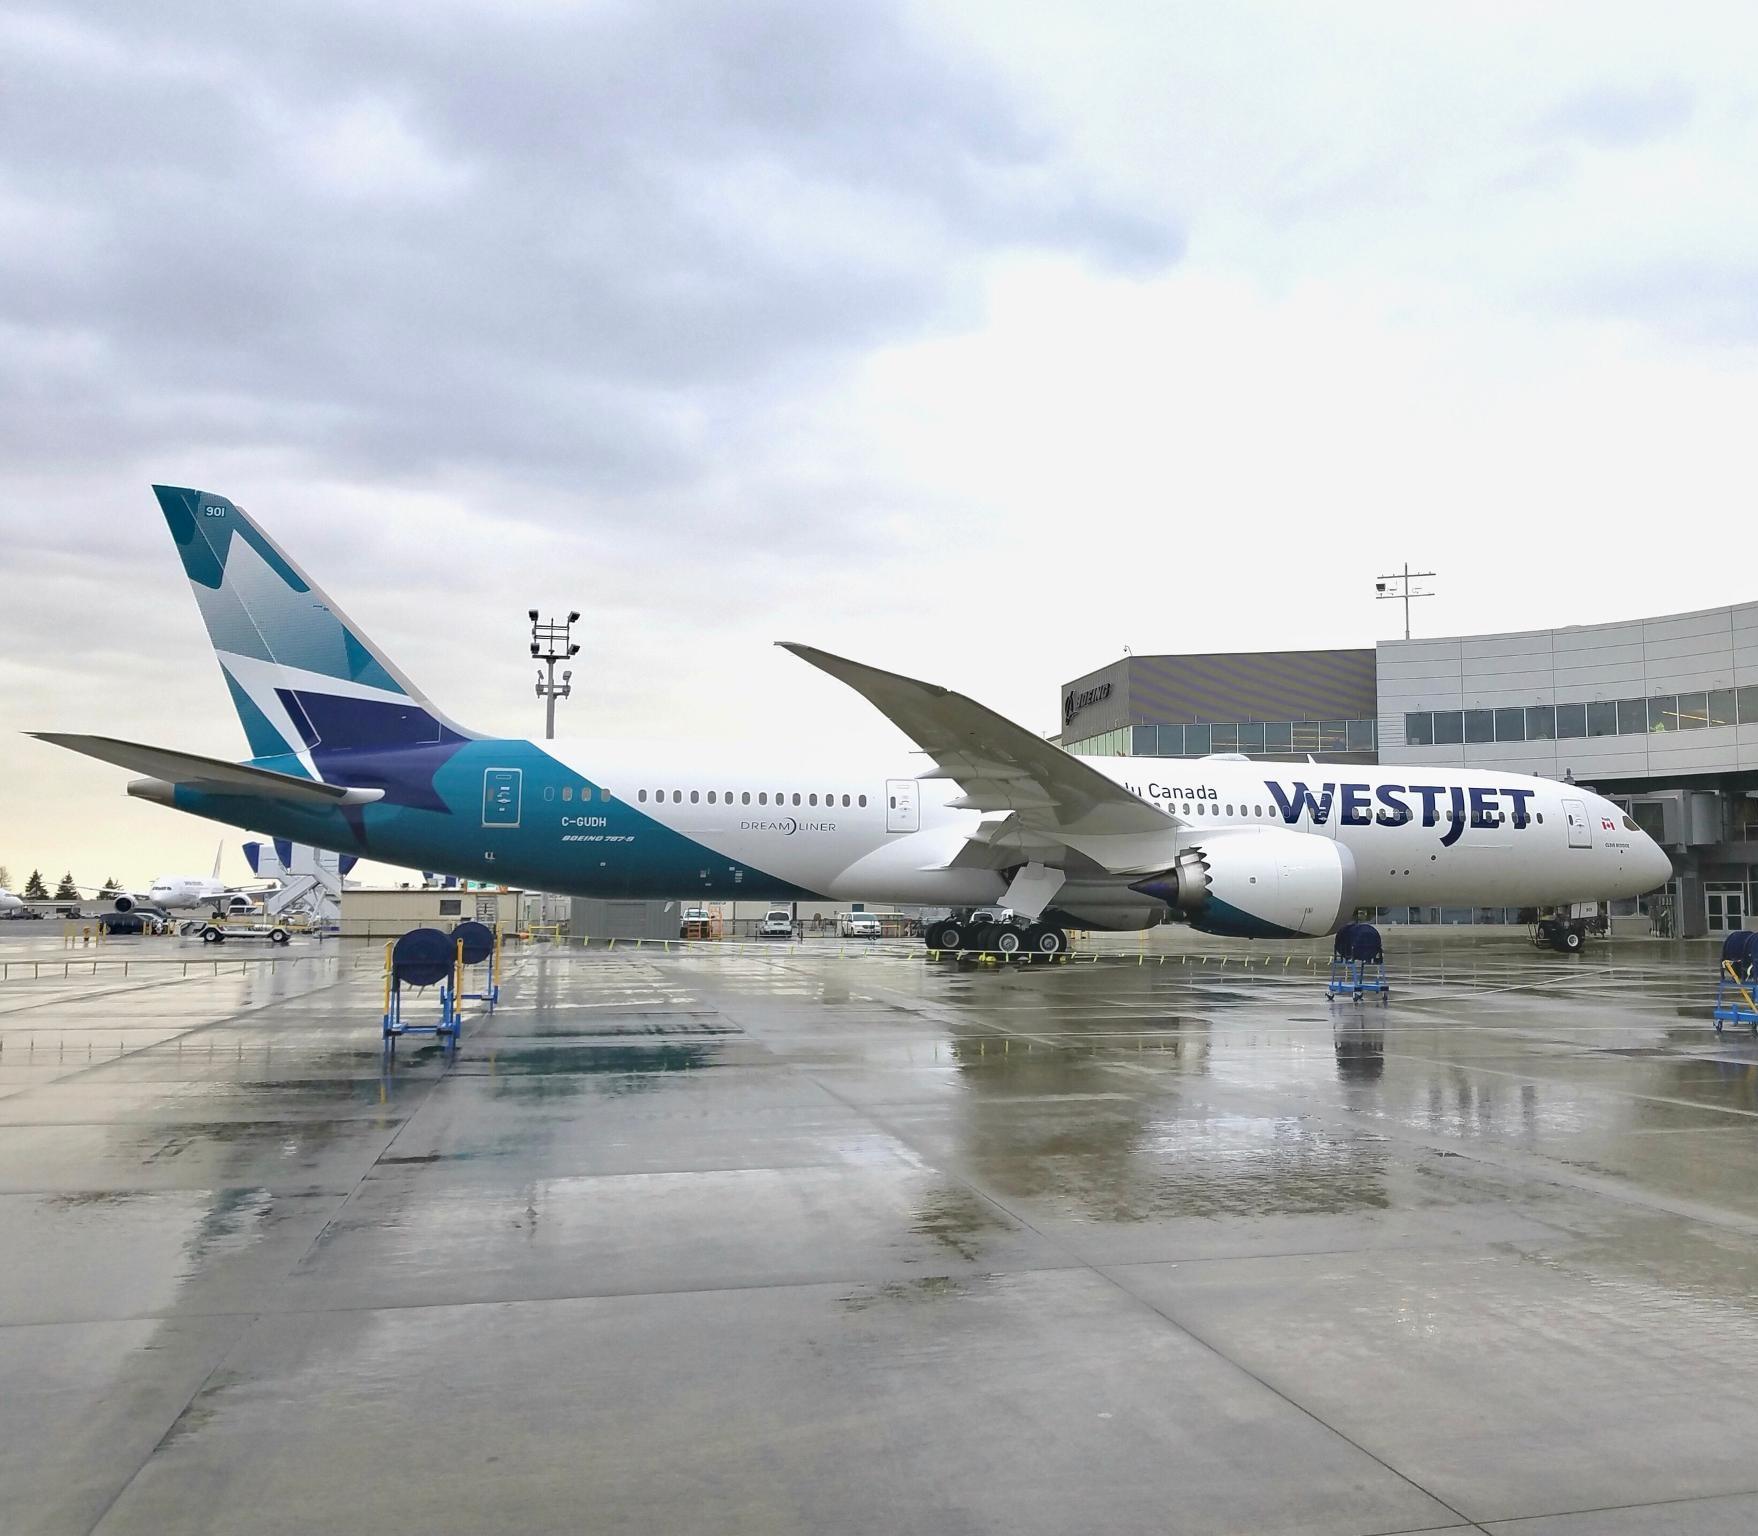 WestJet introduces its Boeing 787 Dreamliner to Vancouver